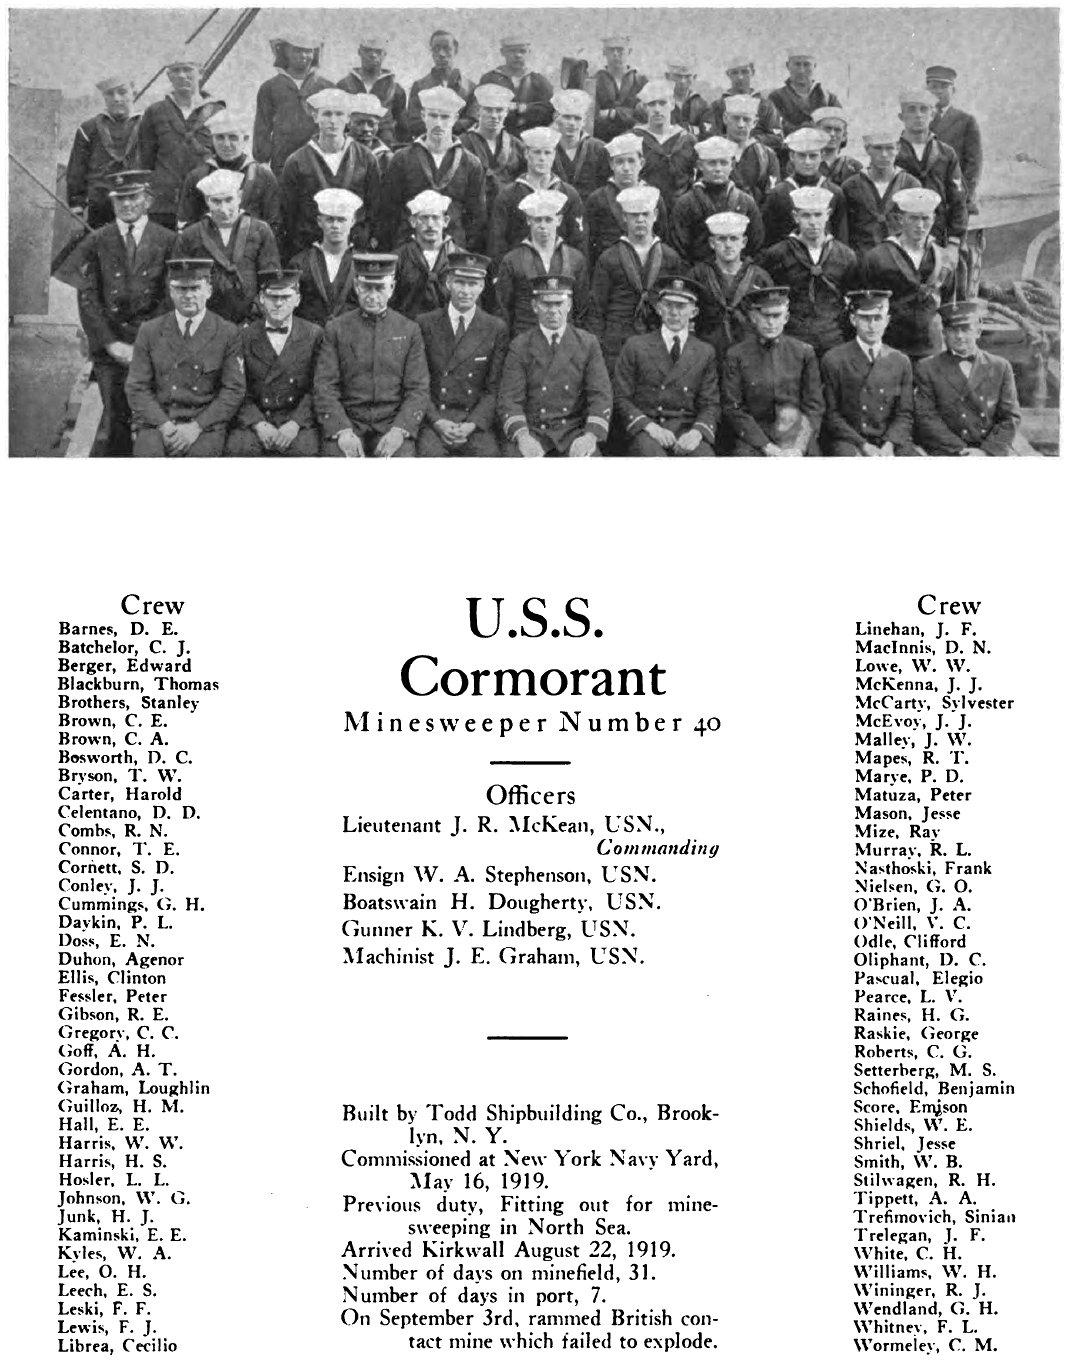 Cormorant Am 40